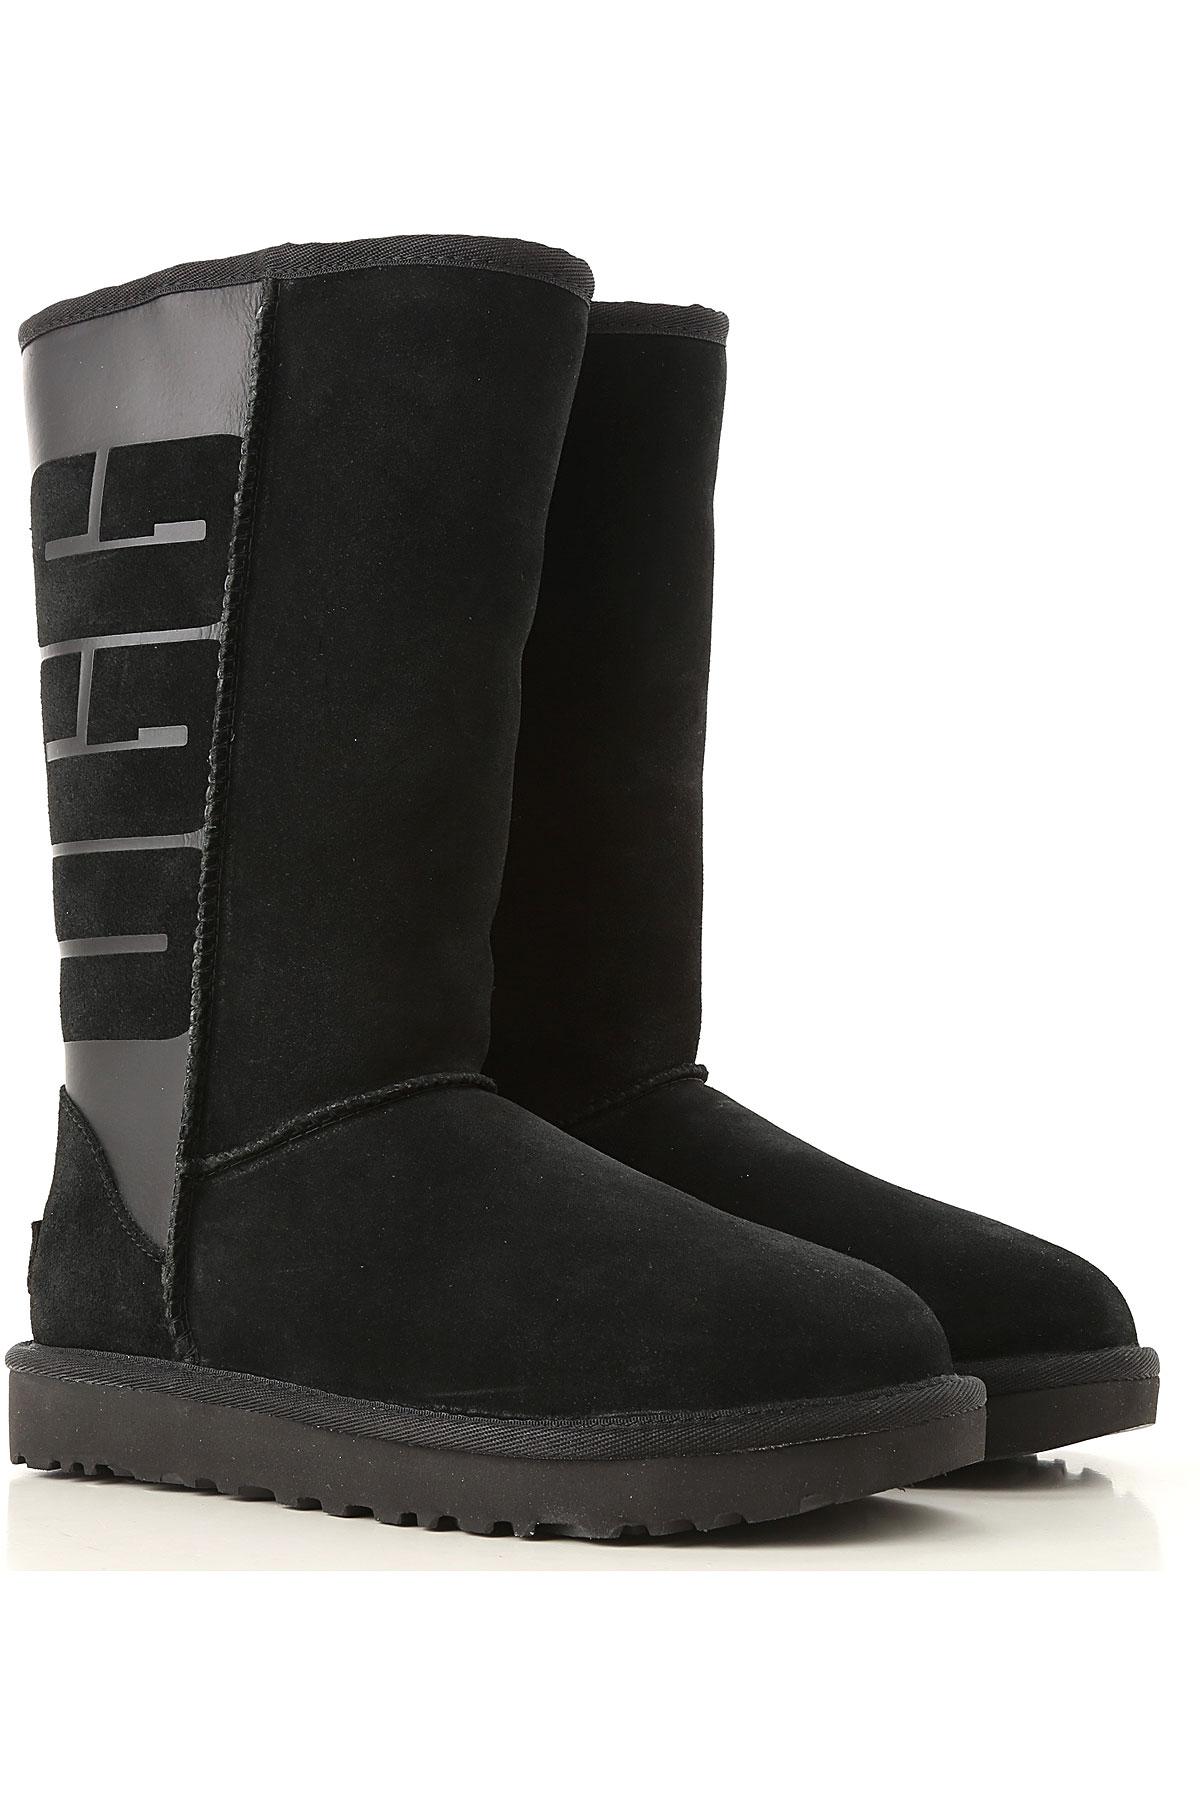 Image of UGG Boots for Women, Booties, Black, suede, 2017, USA 5 UK 3 5 EU 36 JAPAN 220 USA 6 UK 4 5 EU 37 JAPAN 230 USA 7 UK 5 5 EU 38 JAPAN 240 USA 8 UK 6 5 EU 39 JAPAN 250